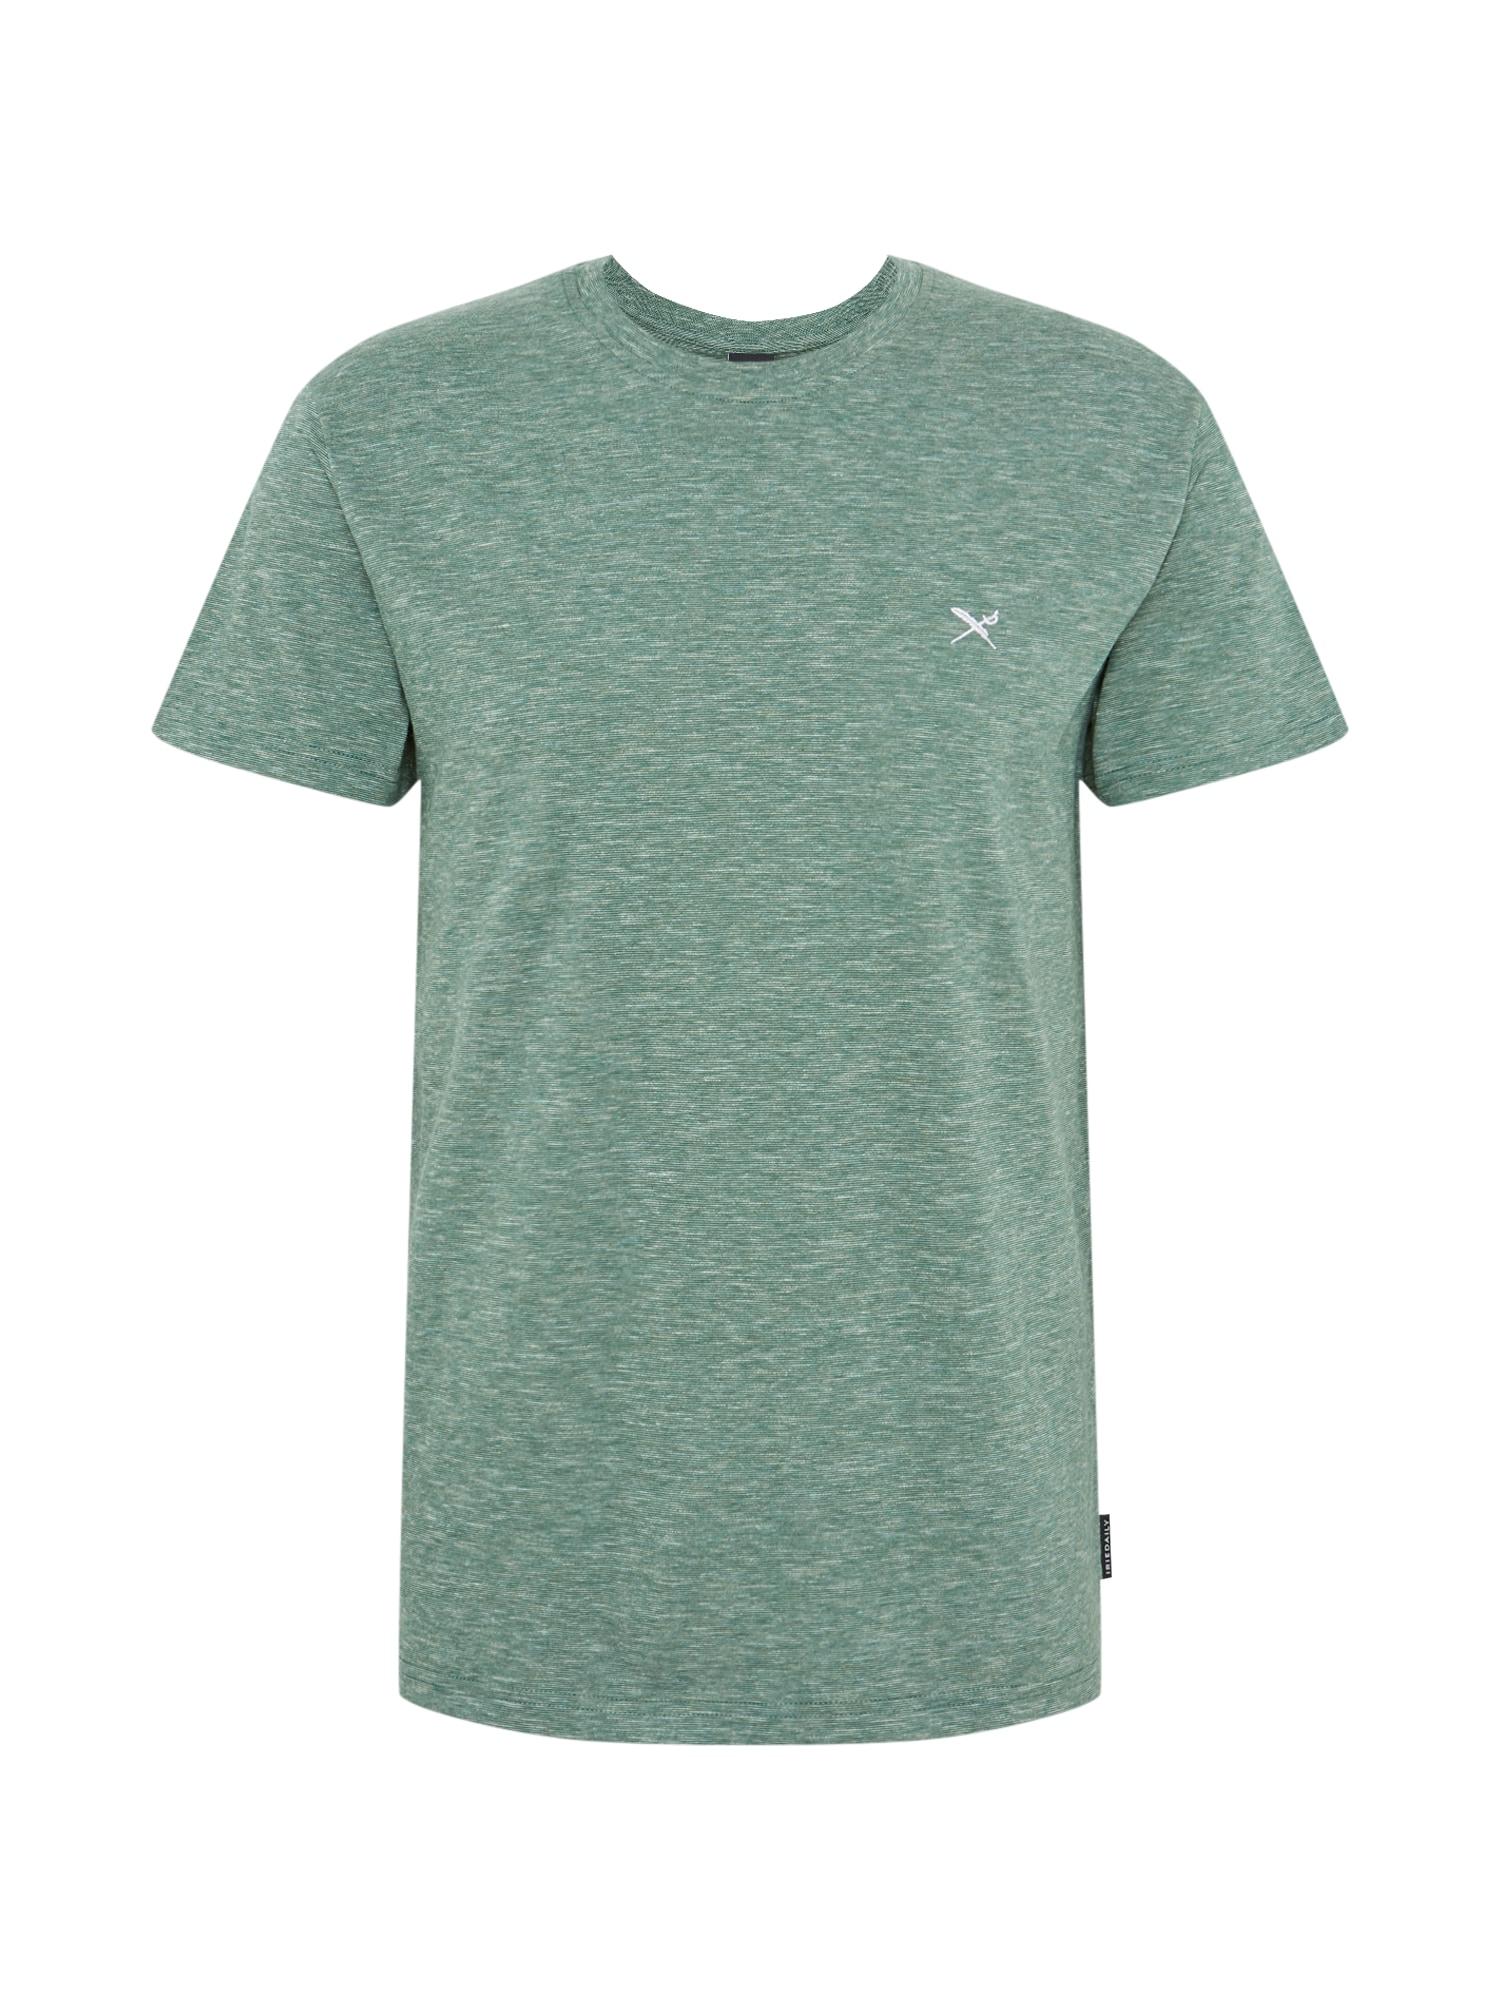 Tričko Chamisso tmavě zelená Iriedaily